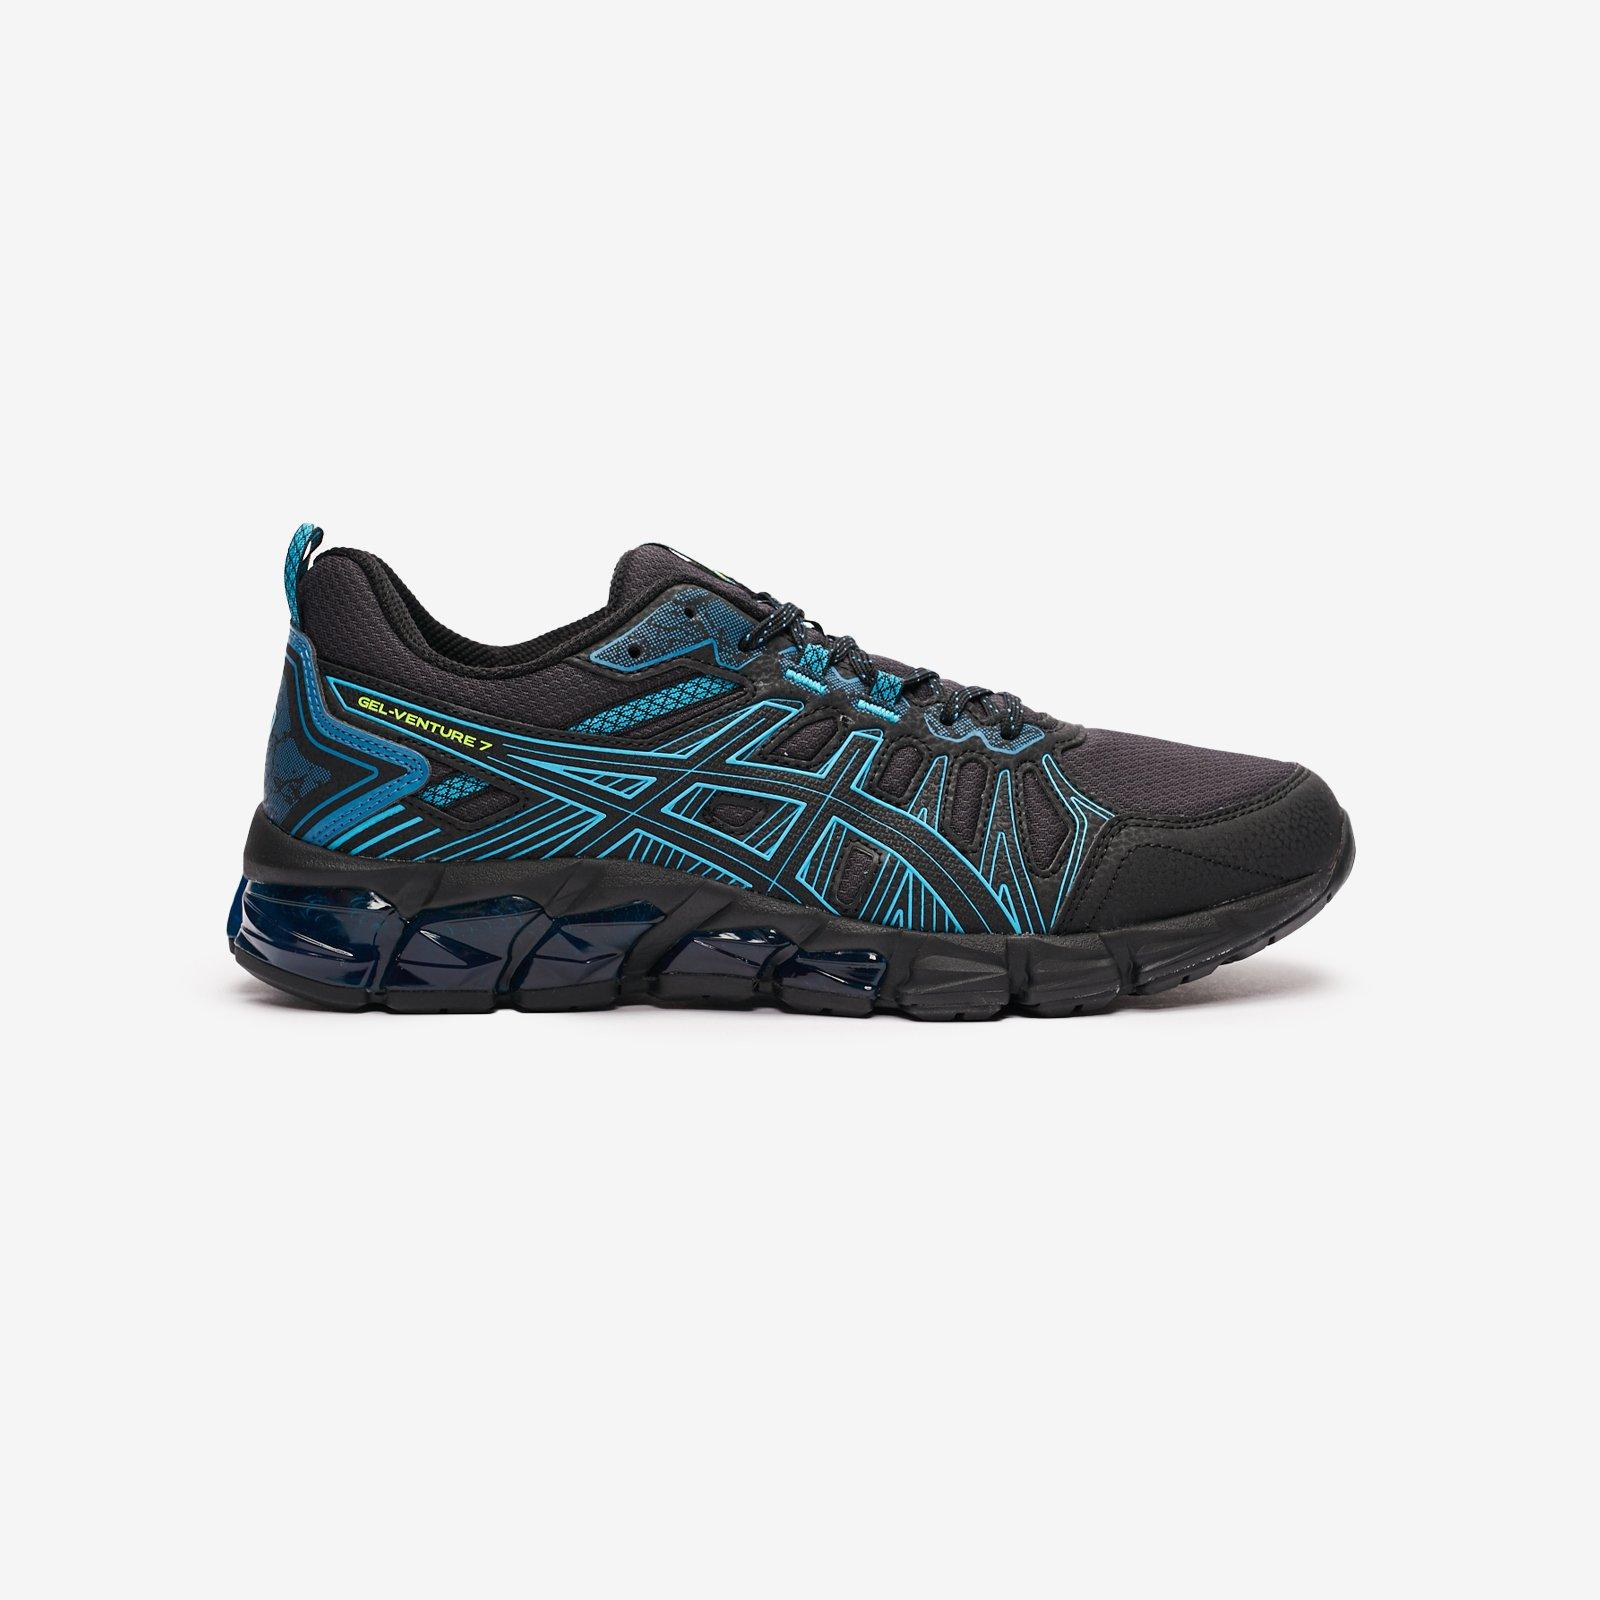 Asics Sportstyle Gel-Venture 180 - 1201a279-004 - SNS   sneakers ...